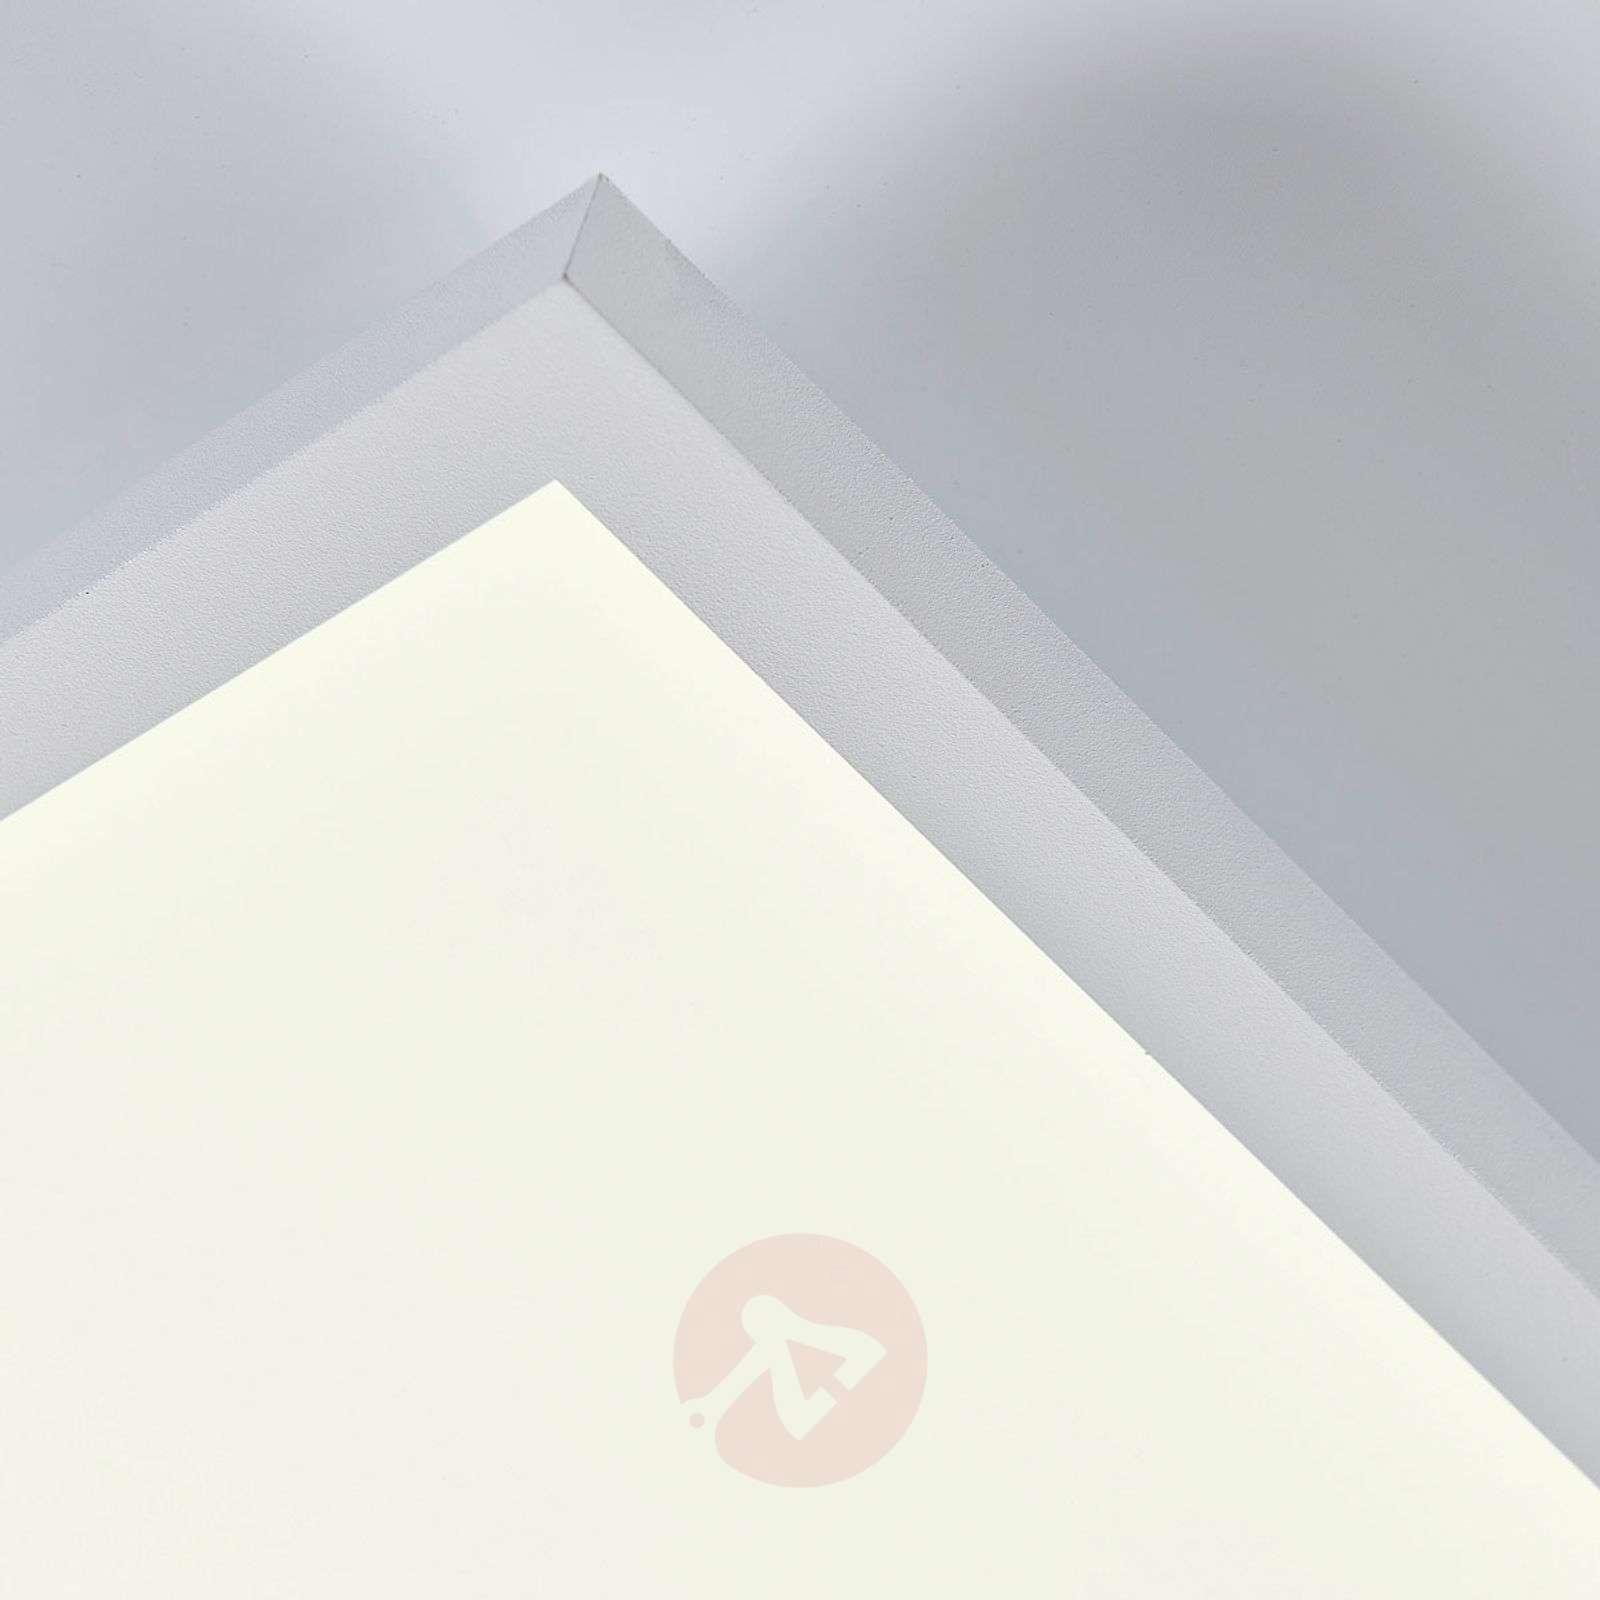 Nelikulmainen LED-paneeli Philia, 40cm, 3000-6000K-9621212-011